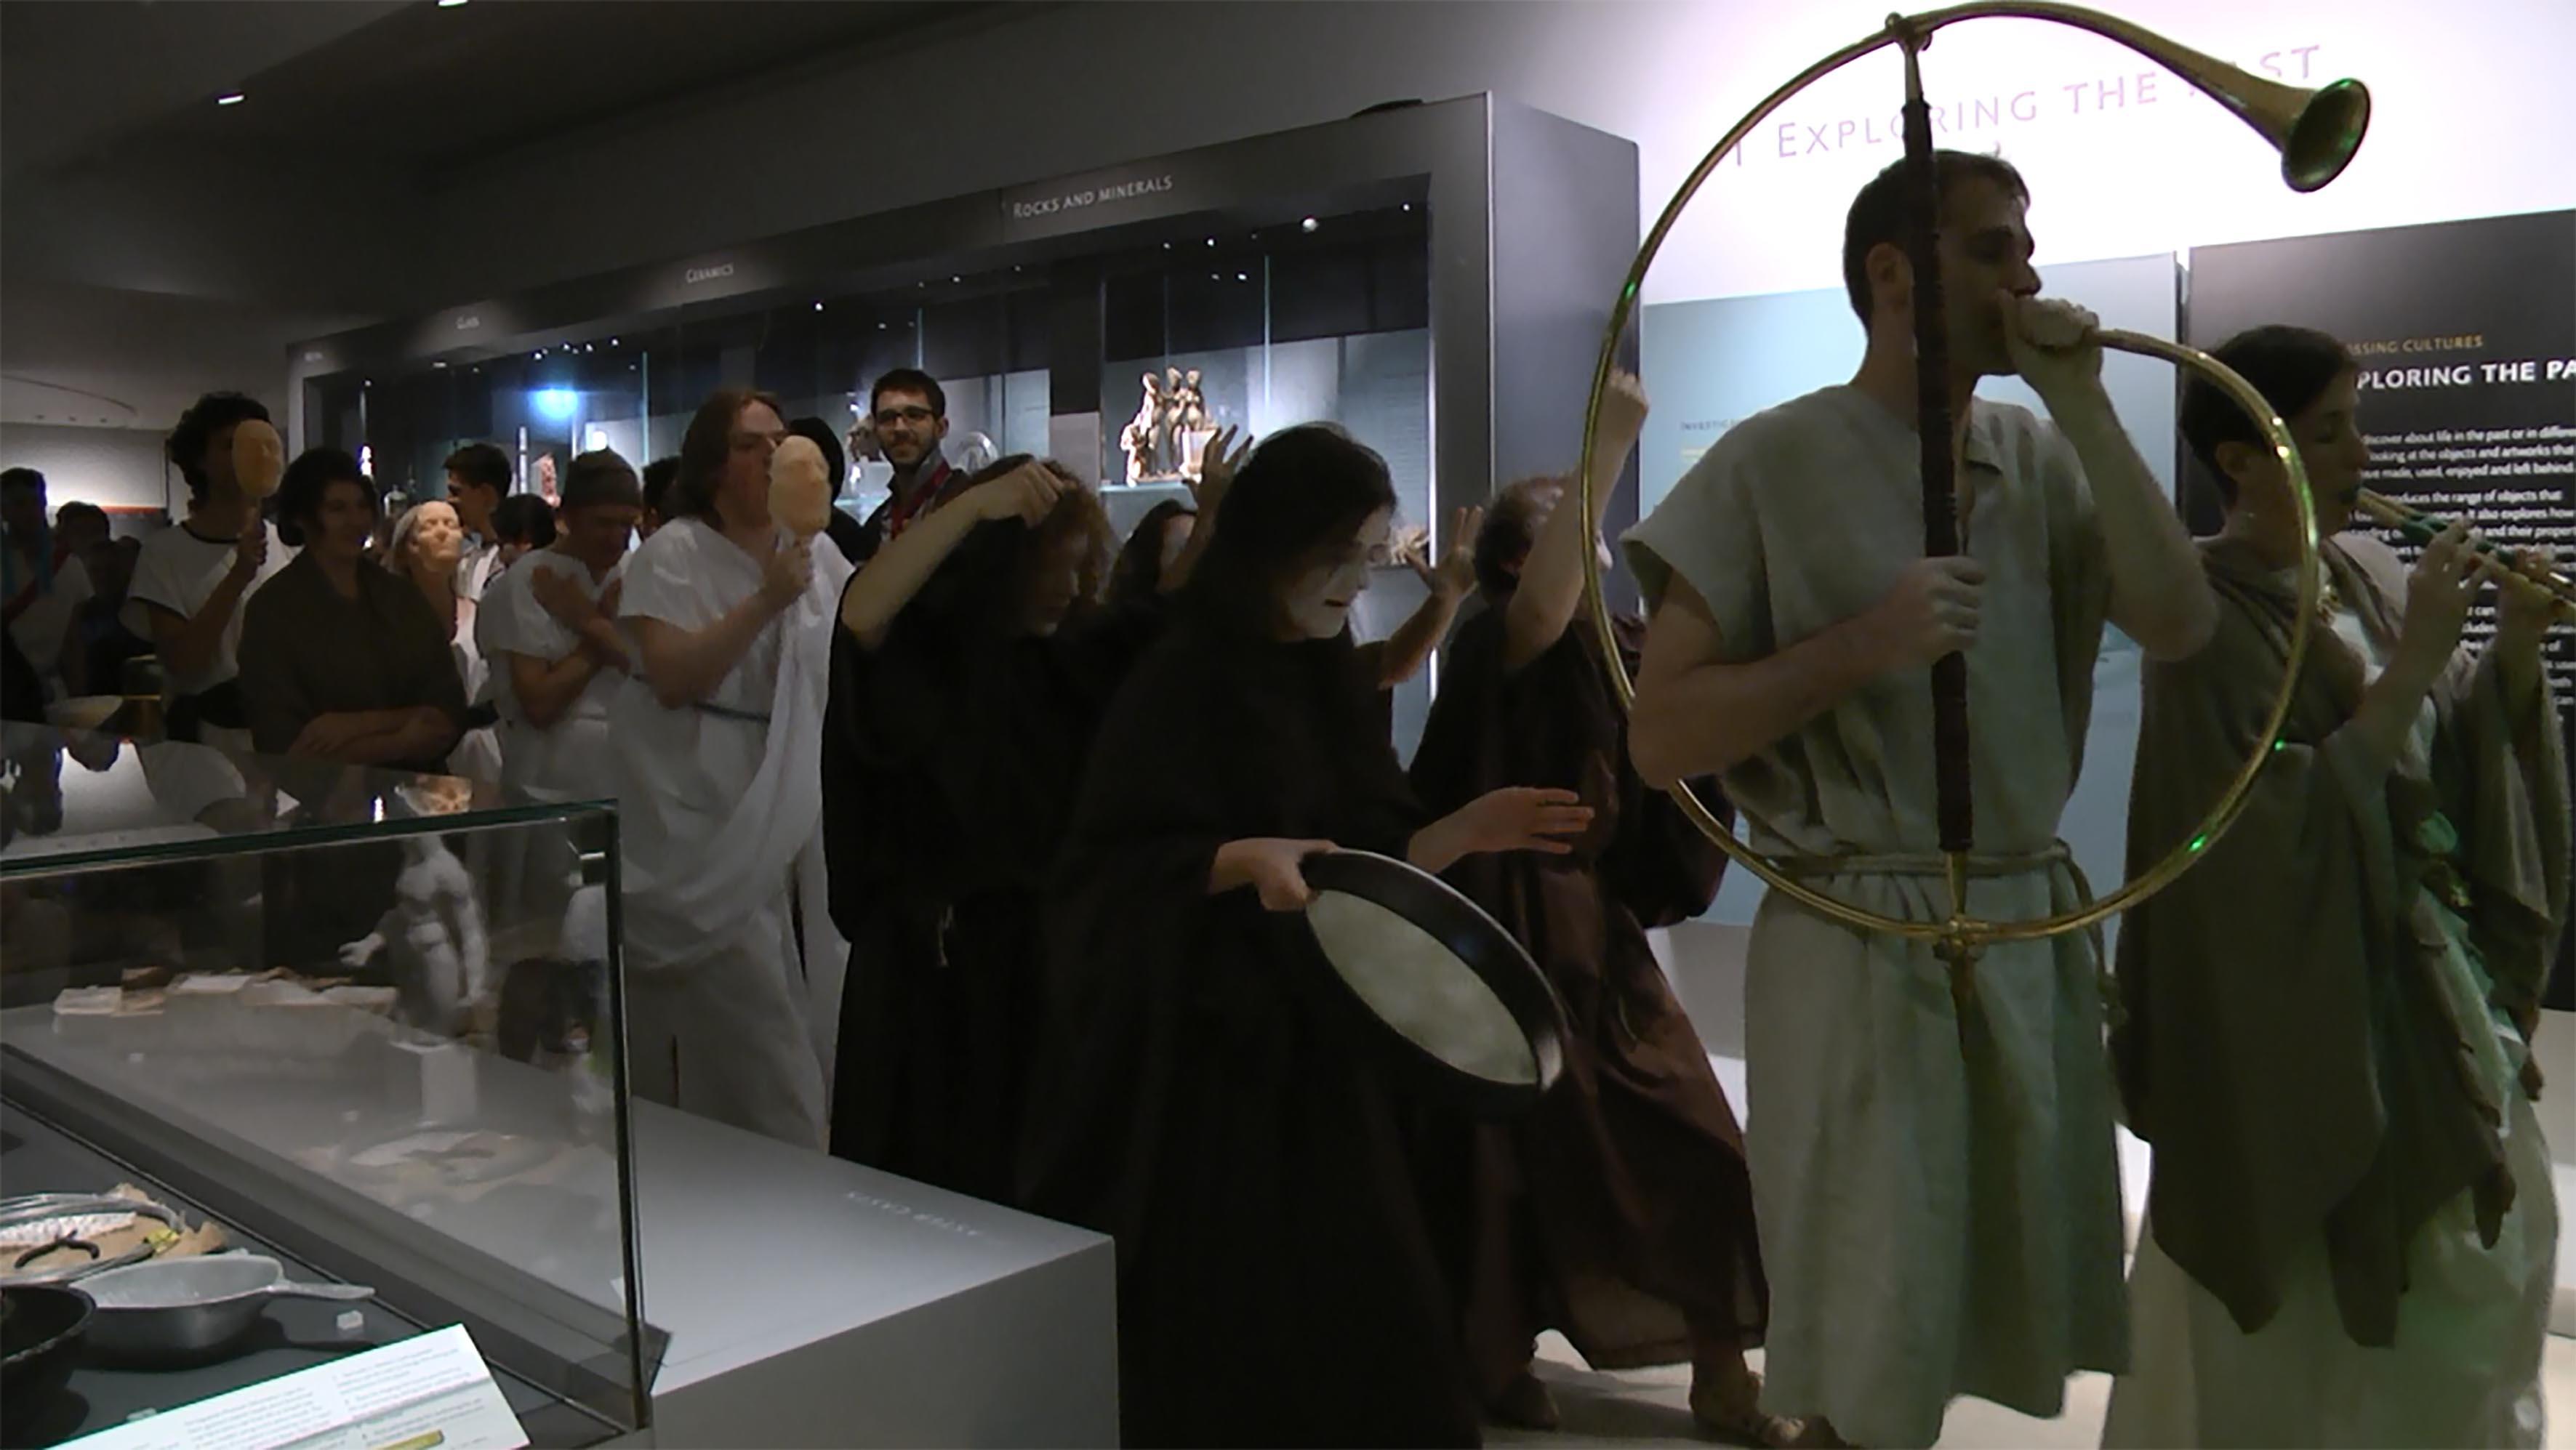 Roman funeral